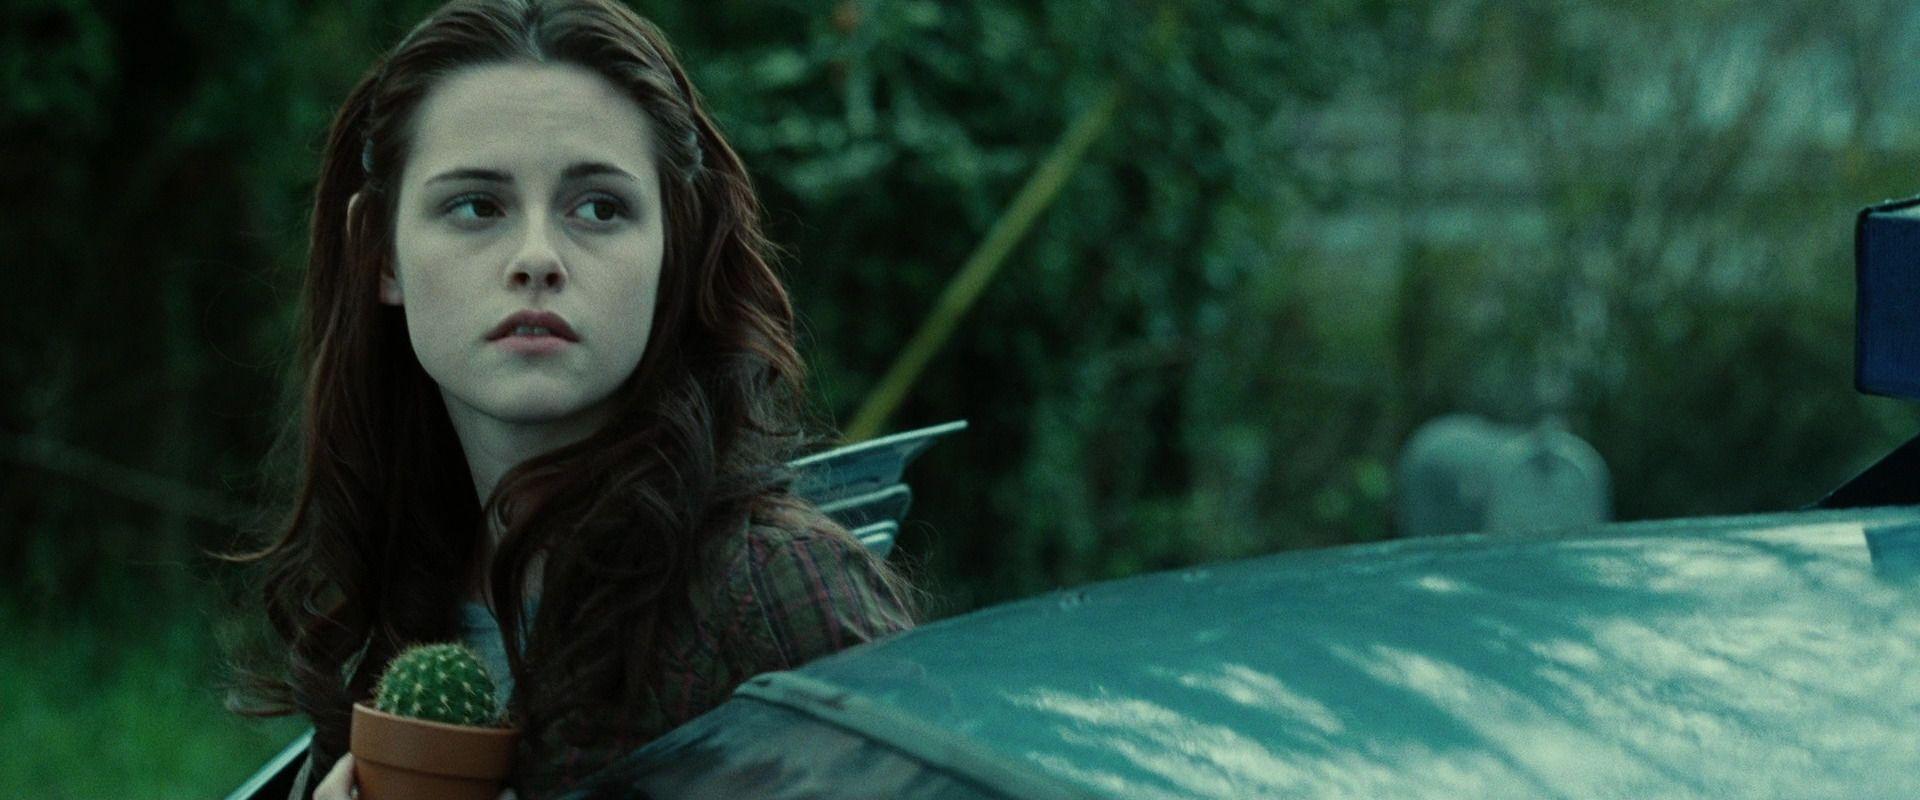 Pin By Ashley Harper On Films Twilight Scenes Twilight Photos Twilight Movie